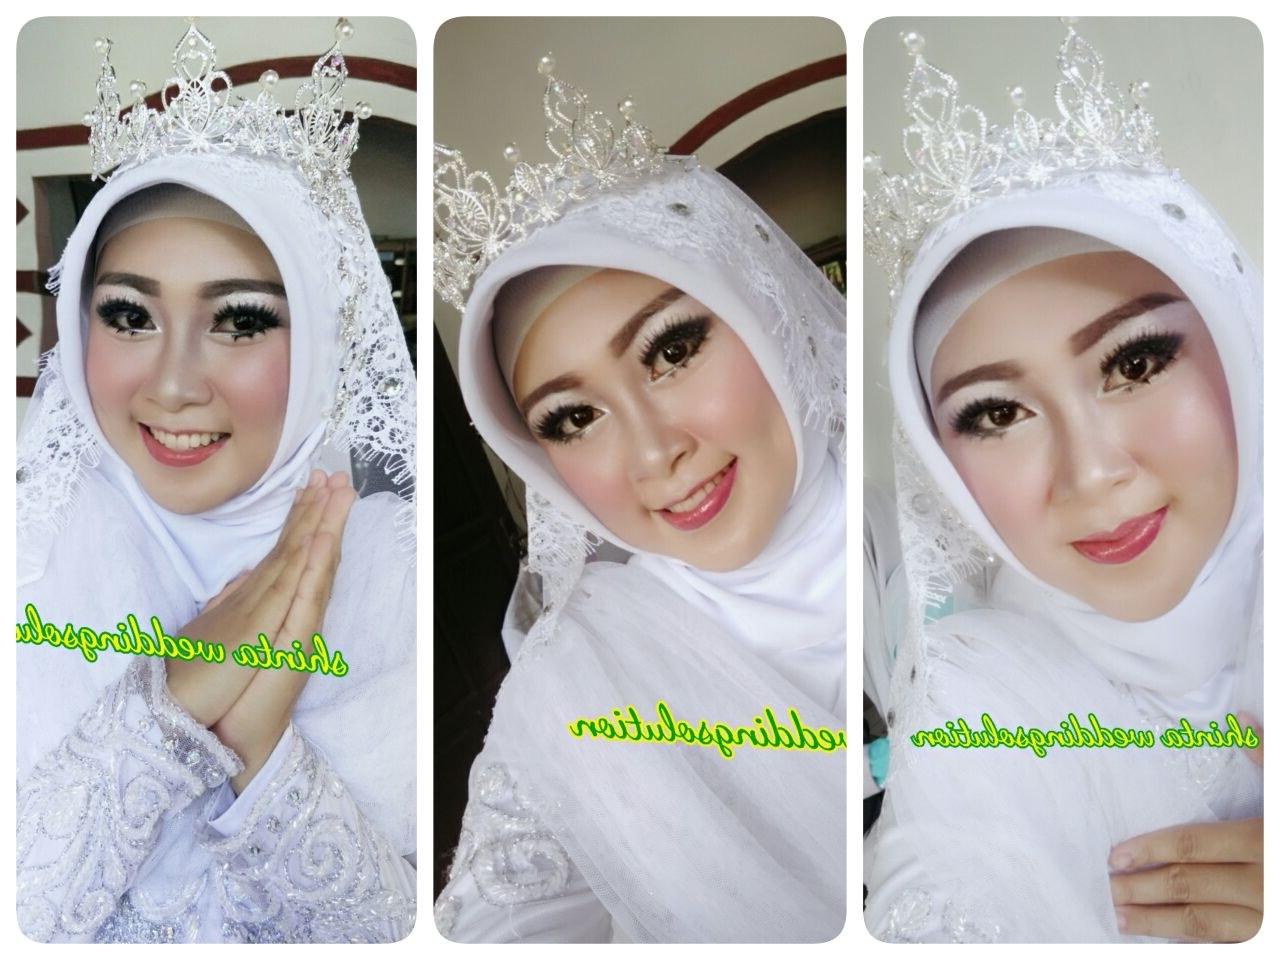 Model Sewa Gaun Pengantin Muslimah Modern Gdd0 Sewa Gaun Pengantin Muslimah Murah